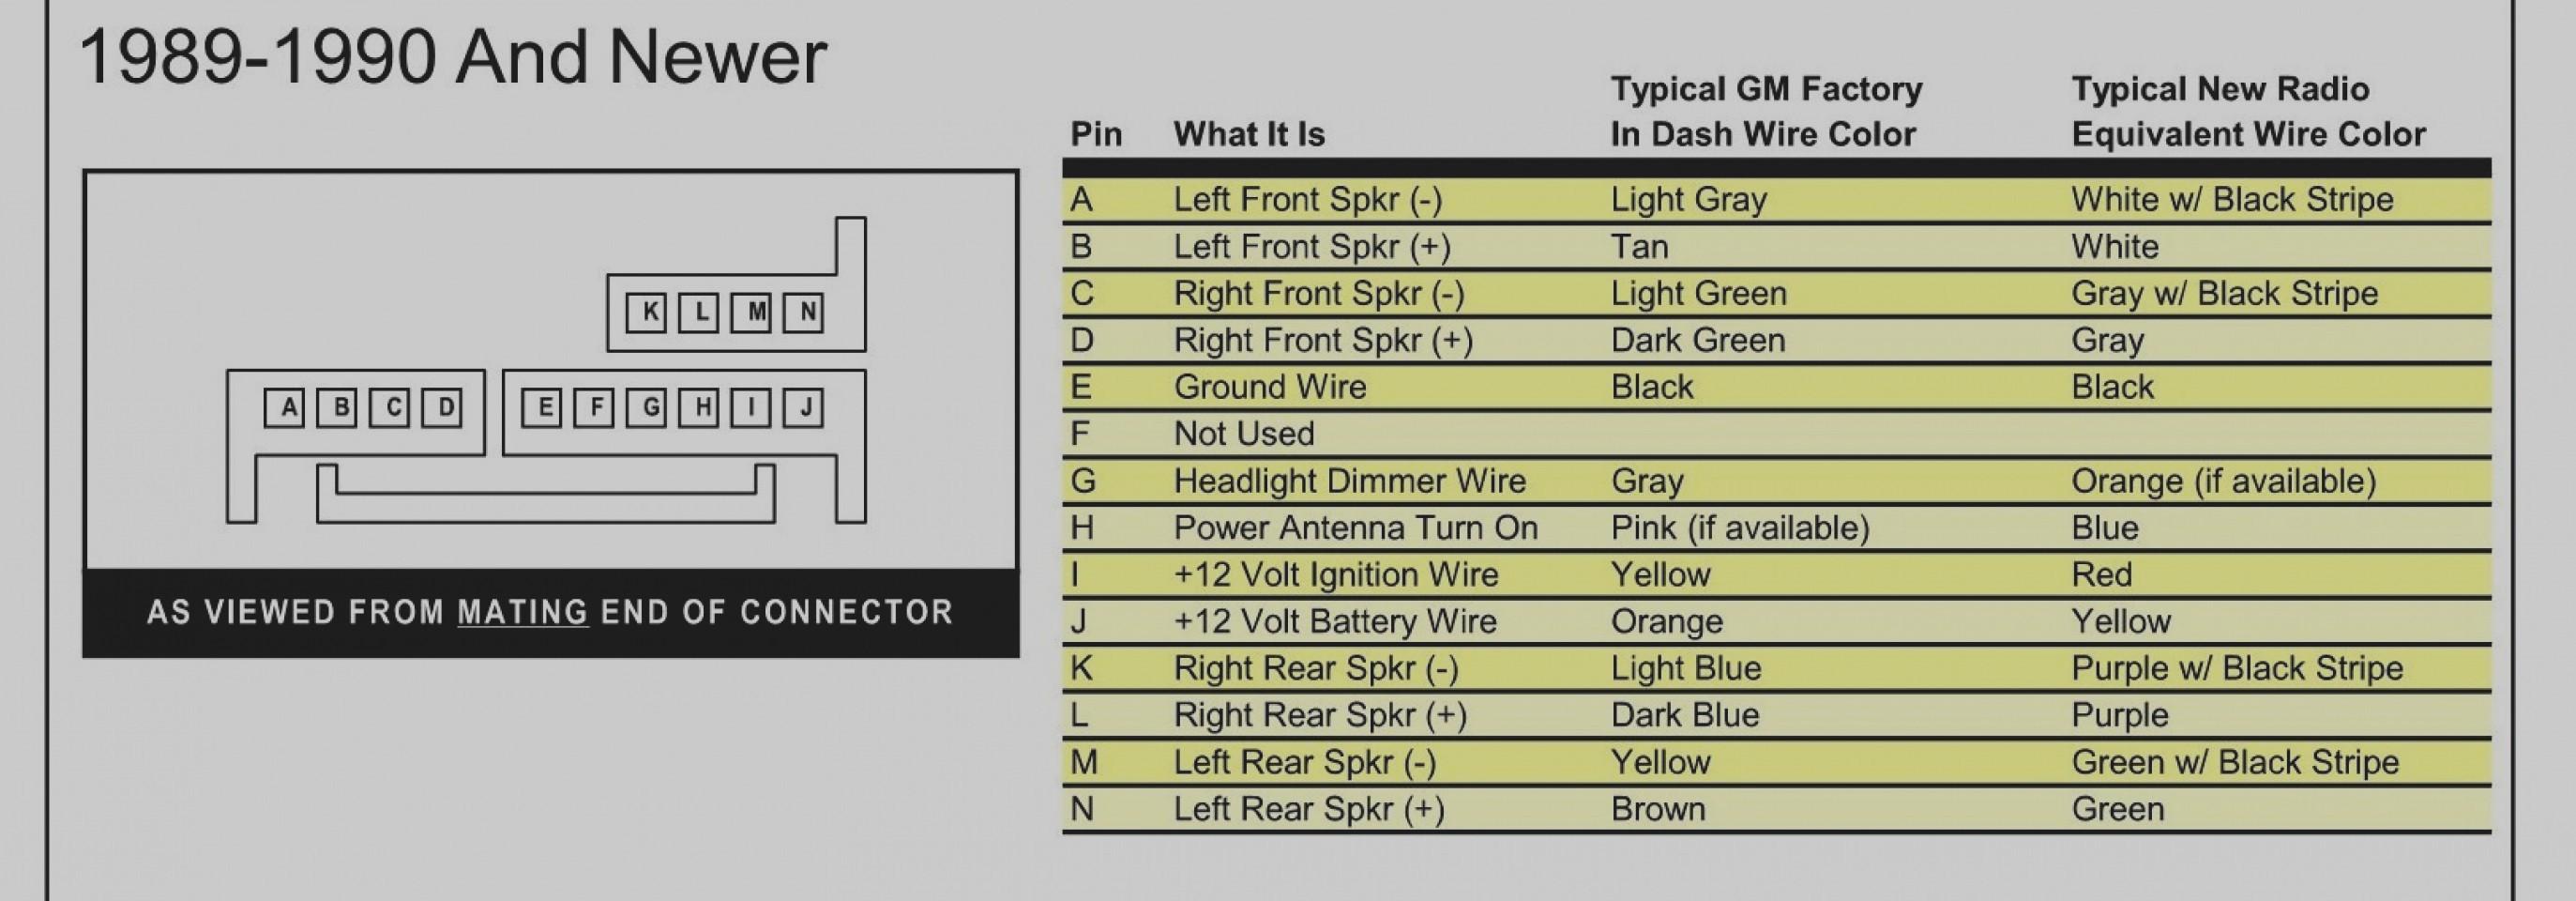 1990 chevy truck headlight wiring diagram vl 9229  automotive wiring diagram 2002 chevy silverado radio  automotive wiring diagram 2002 chevy